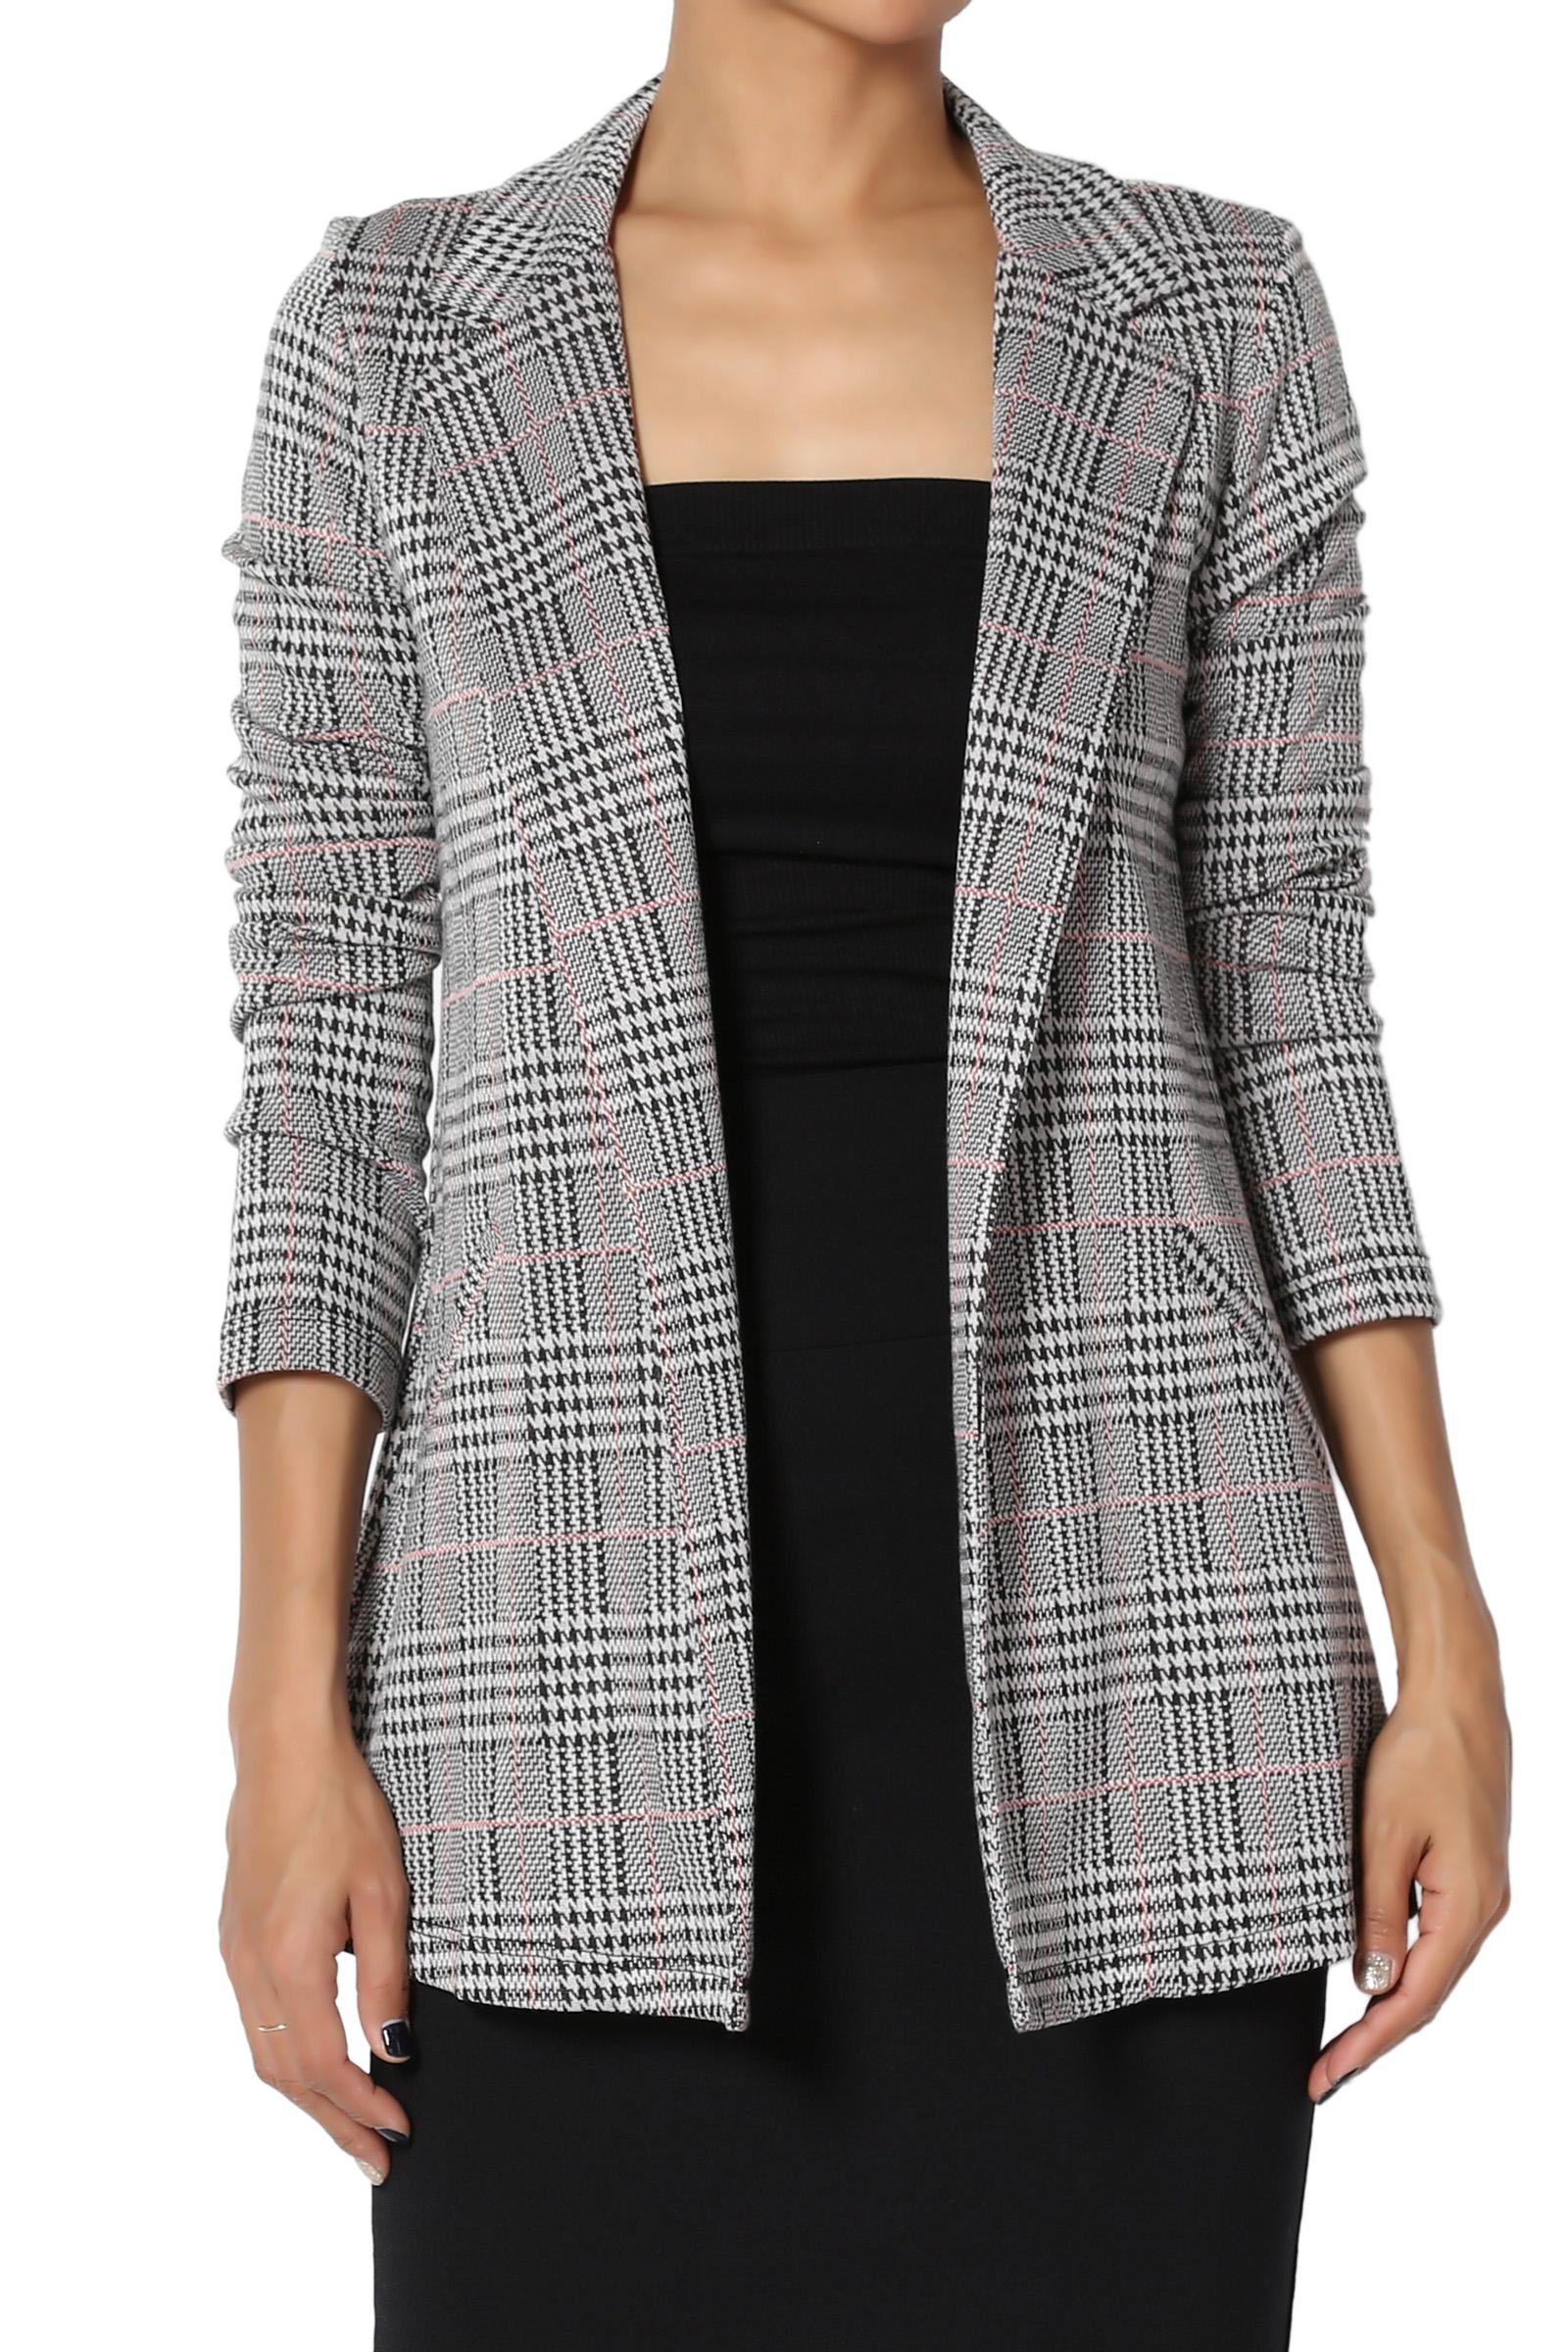 TheMogan Junior's Suitable Stretch Knit Check Plaid Open Front Slim Fit Blazer Jacket